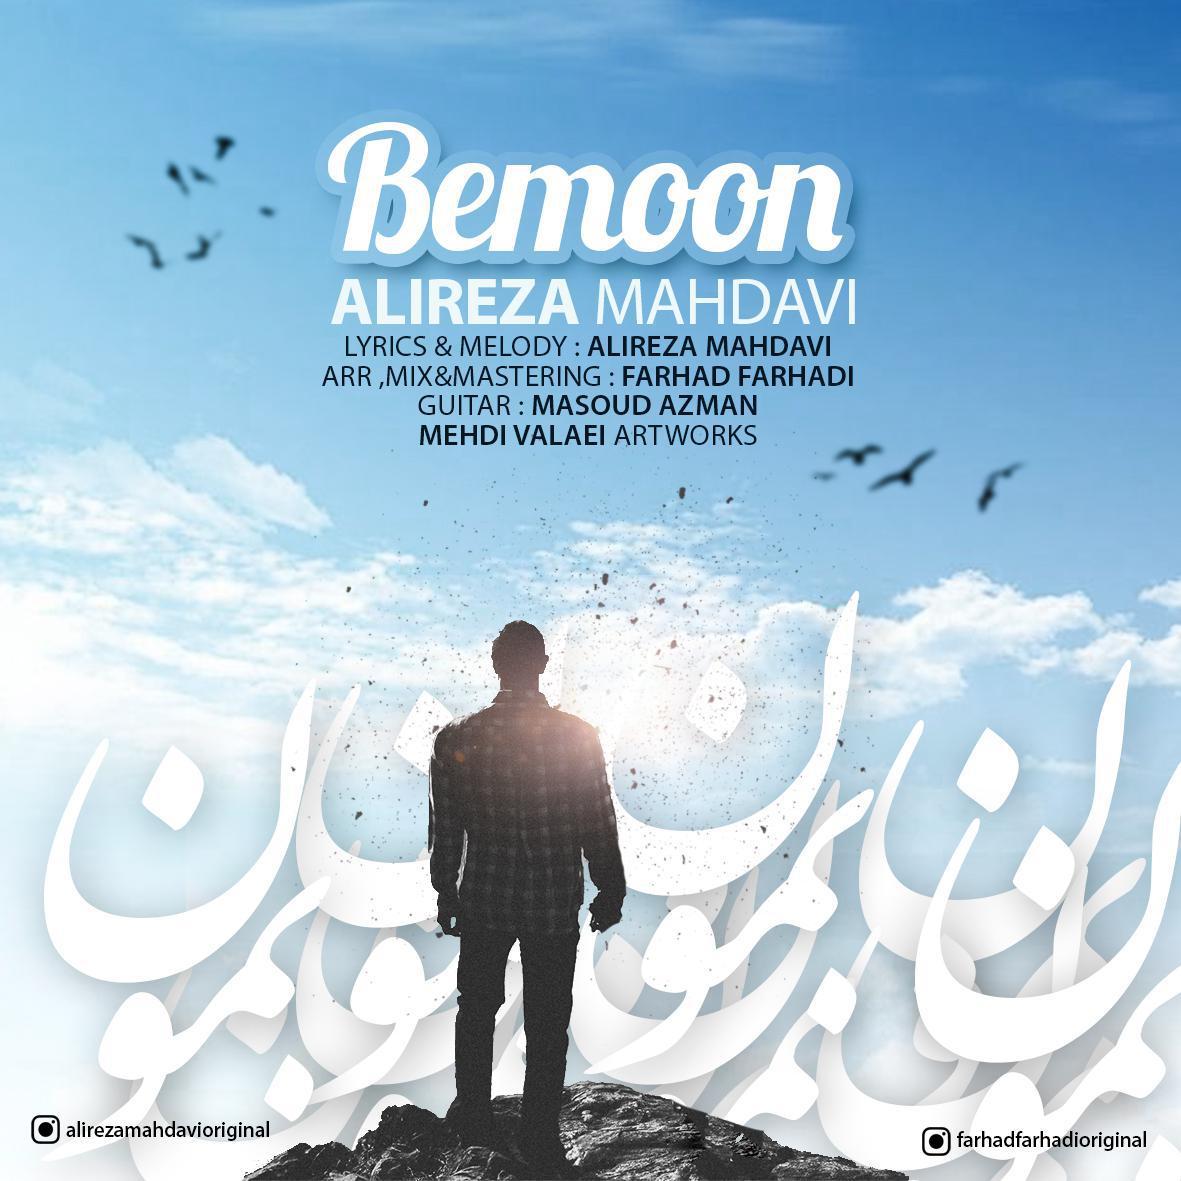 Alireza Mahdavi – Bemoon